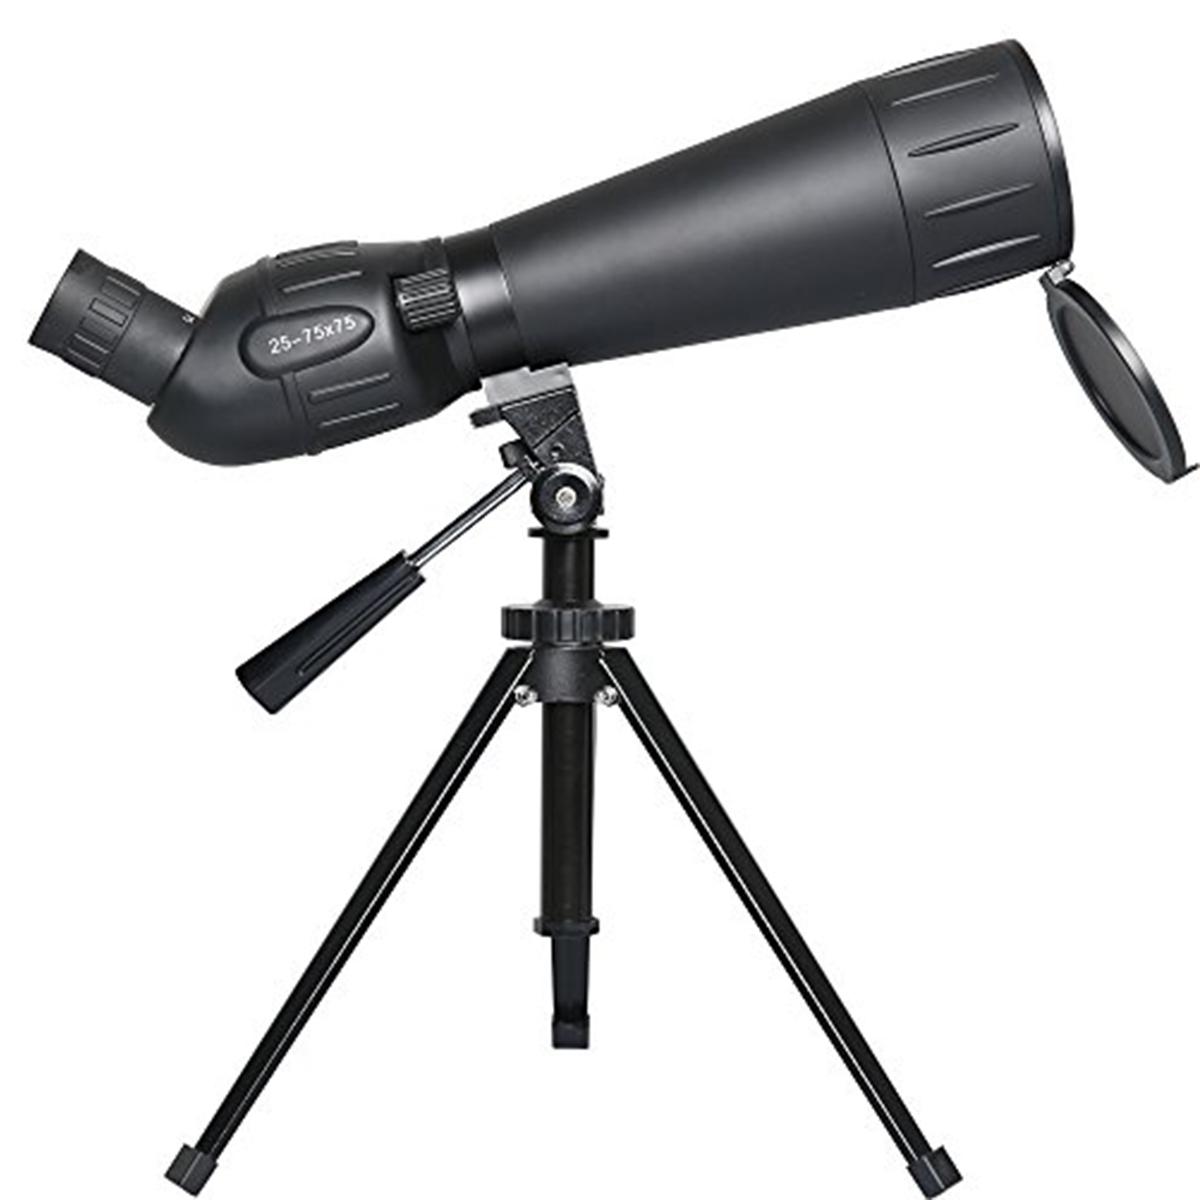 دوربین تک چشمی مدل 25-75x75